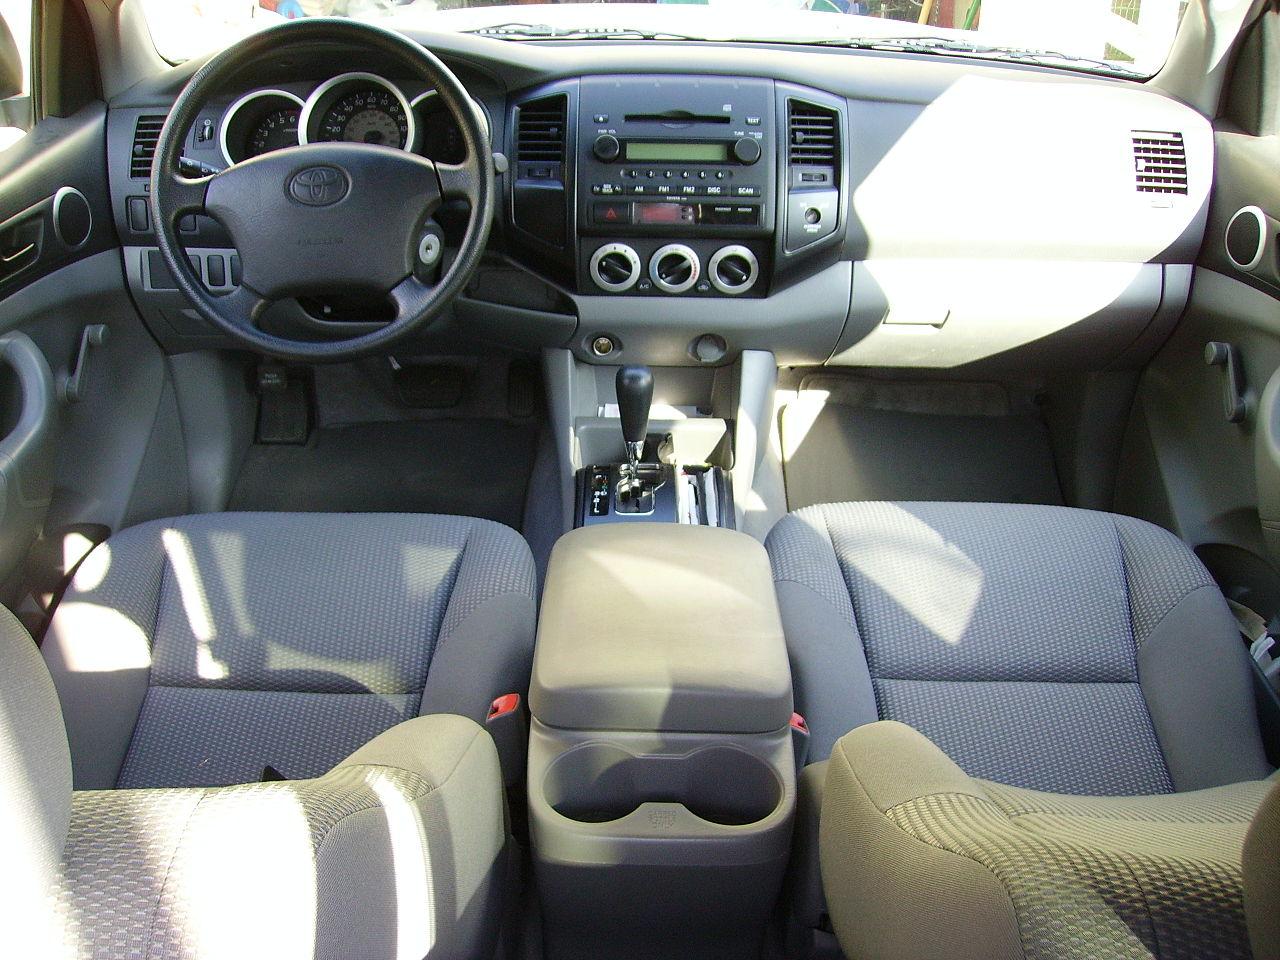 File:06 Toyota Tacoma Interior.JPG